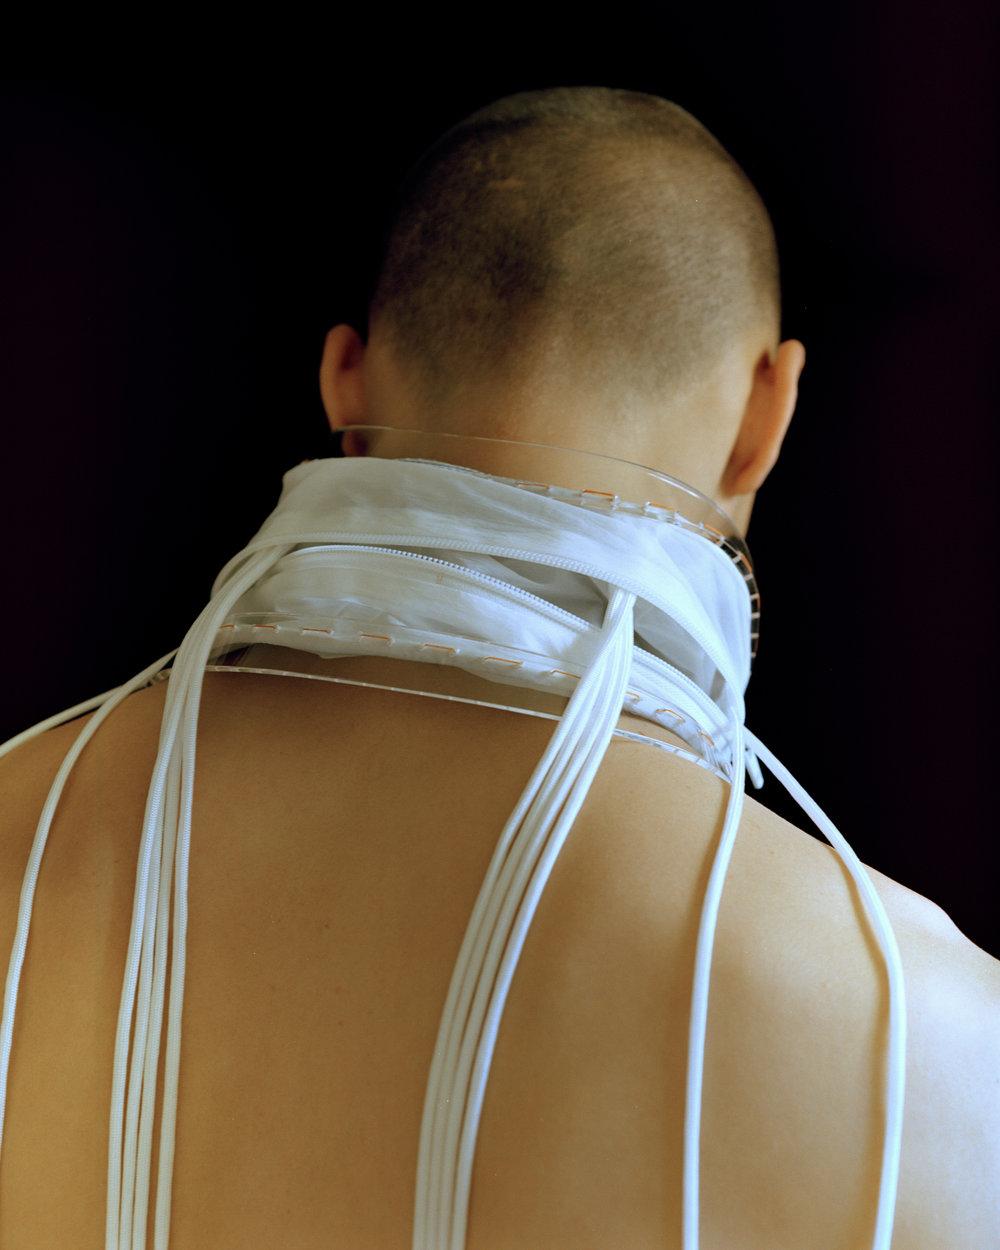 xiaotu tang - Untitled19.jpg